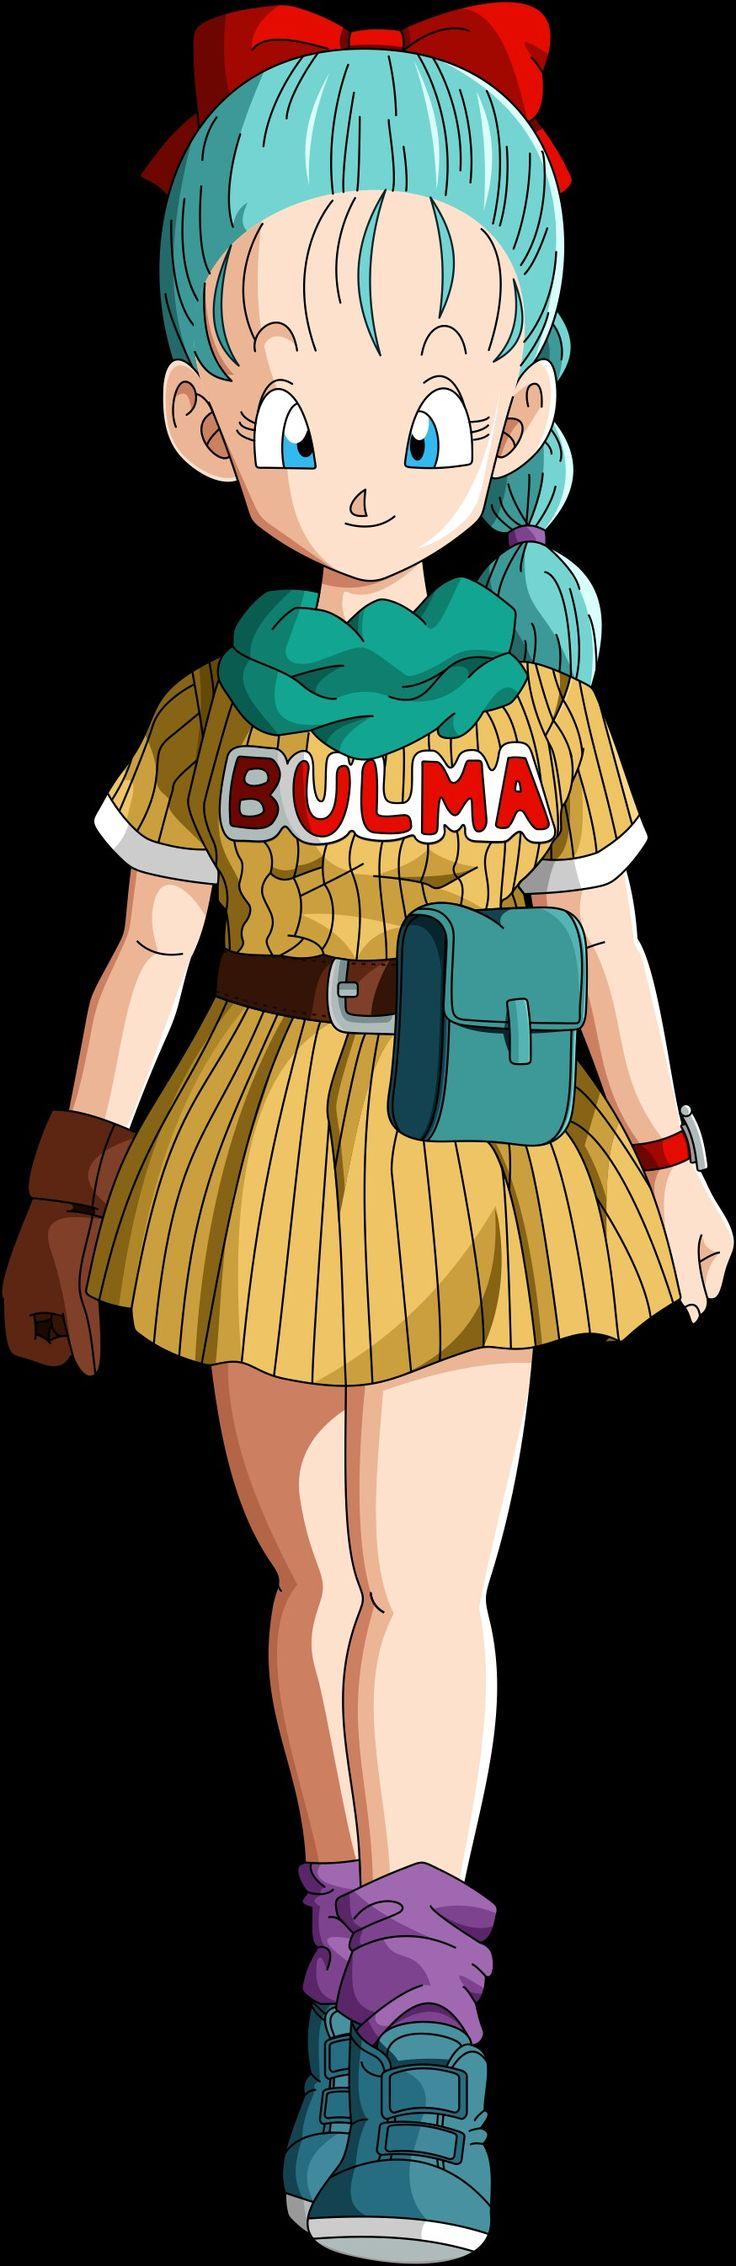 Bulma Brief  - Serie: Dragon Ball (1986-1989) FUNimation (EEUU) / Selecta Vision (España)